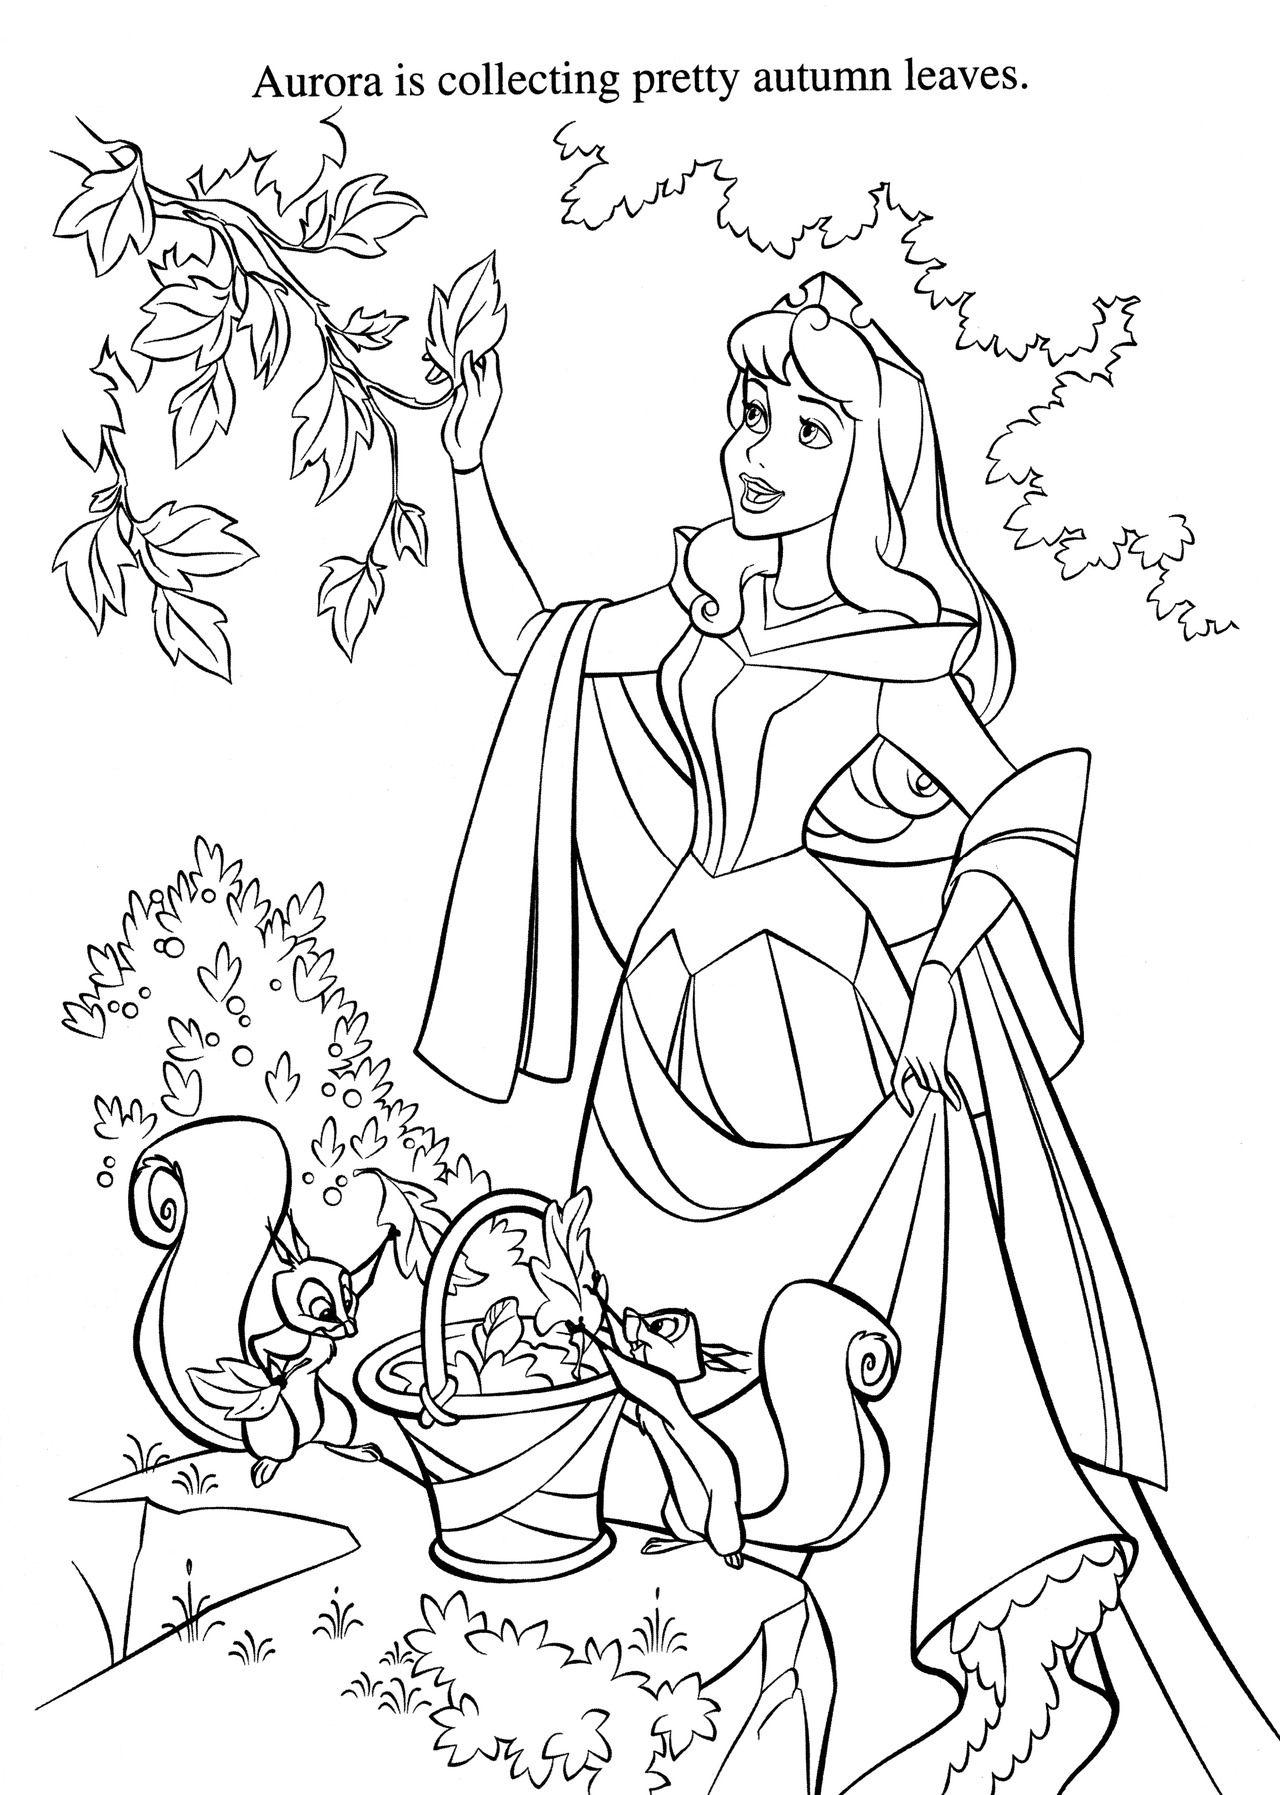 Disney Coloring Pages Disney Coloring Pages Sleeping Beauty Coloring Pages Disney Coloring Pages Printables